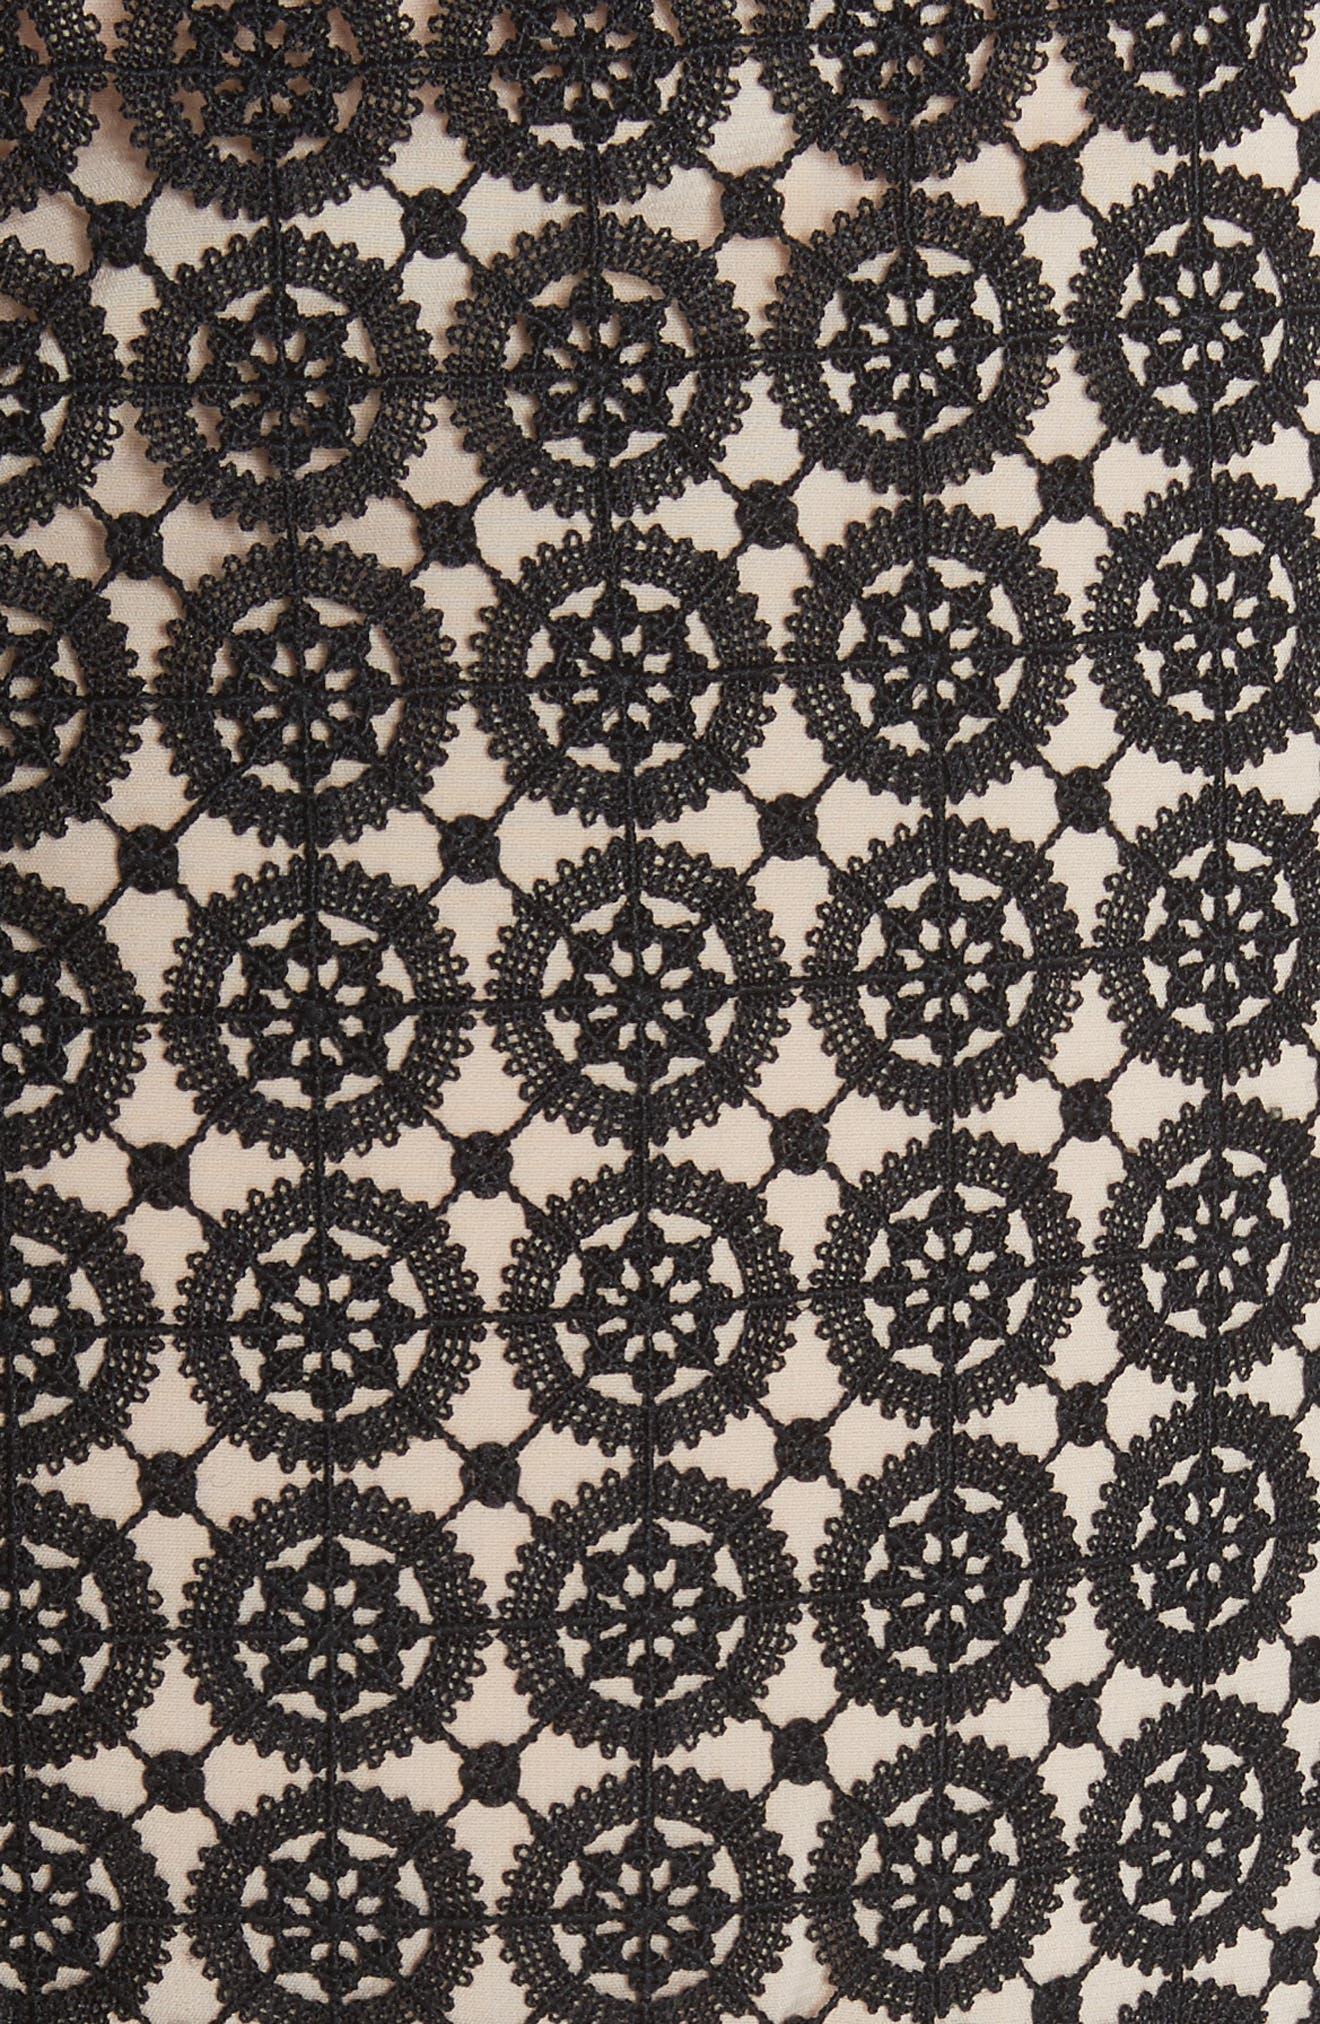 Tamika Handkerchief Lace Dress,                             Alternate thumbnail 5, color,